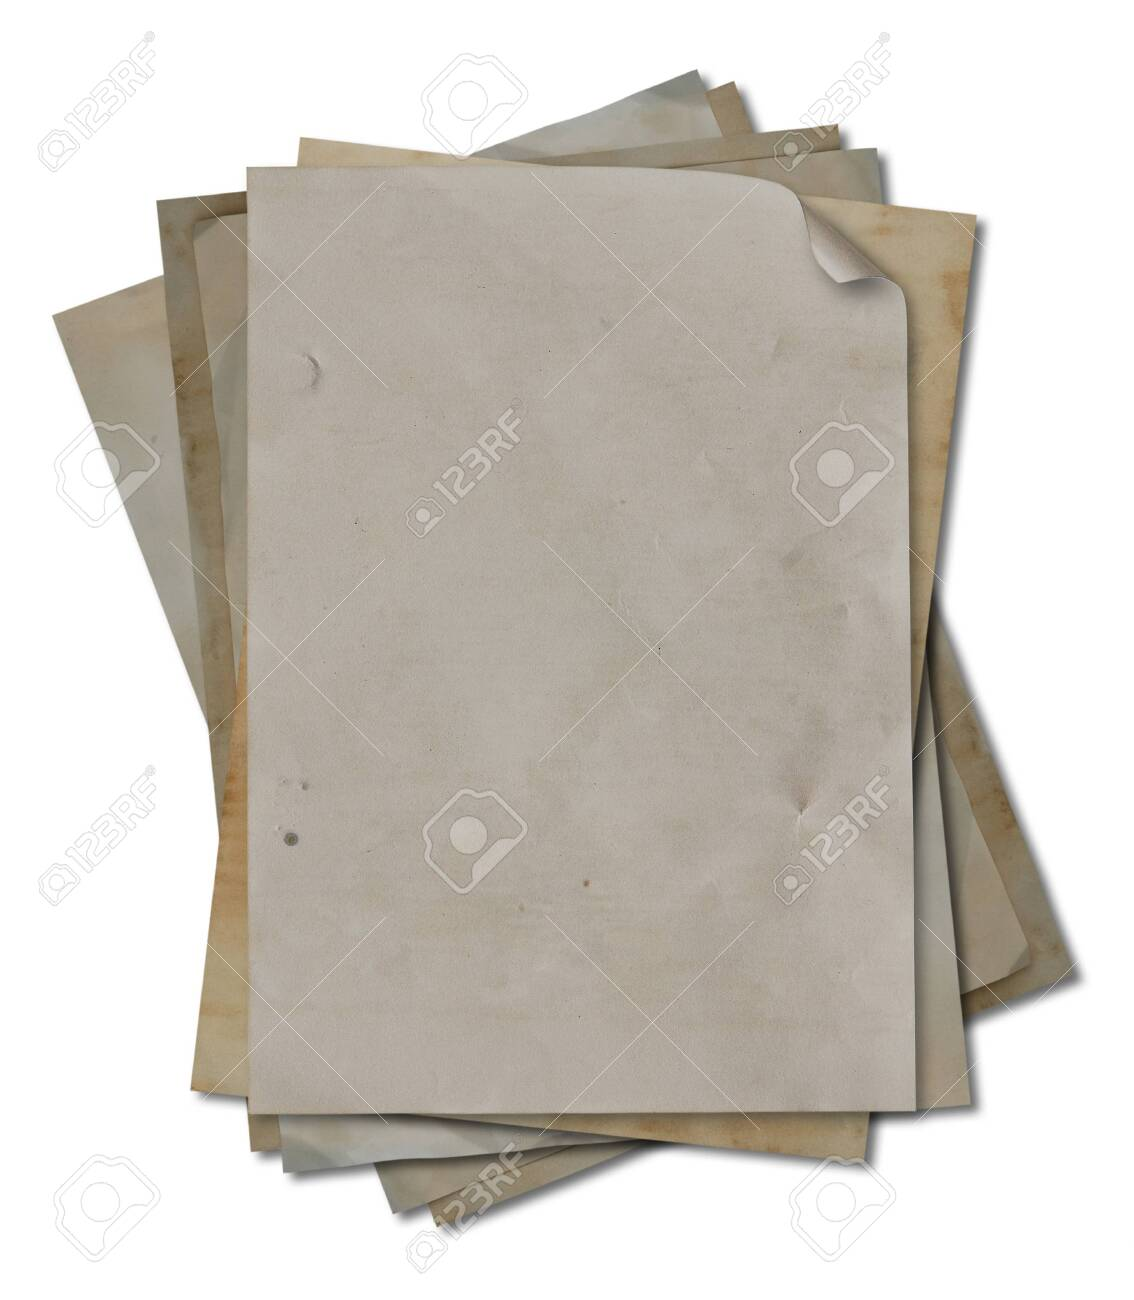 blank vintage paper detail Stock Photo - 9788020